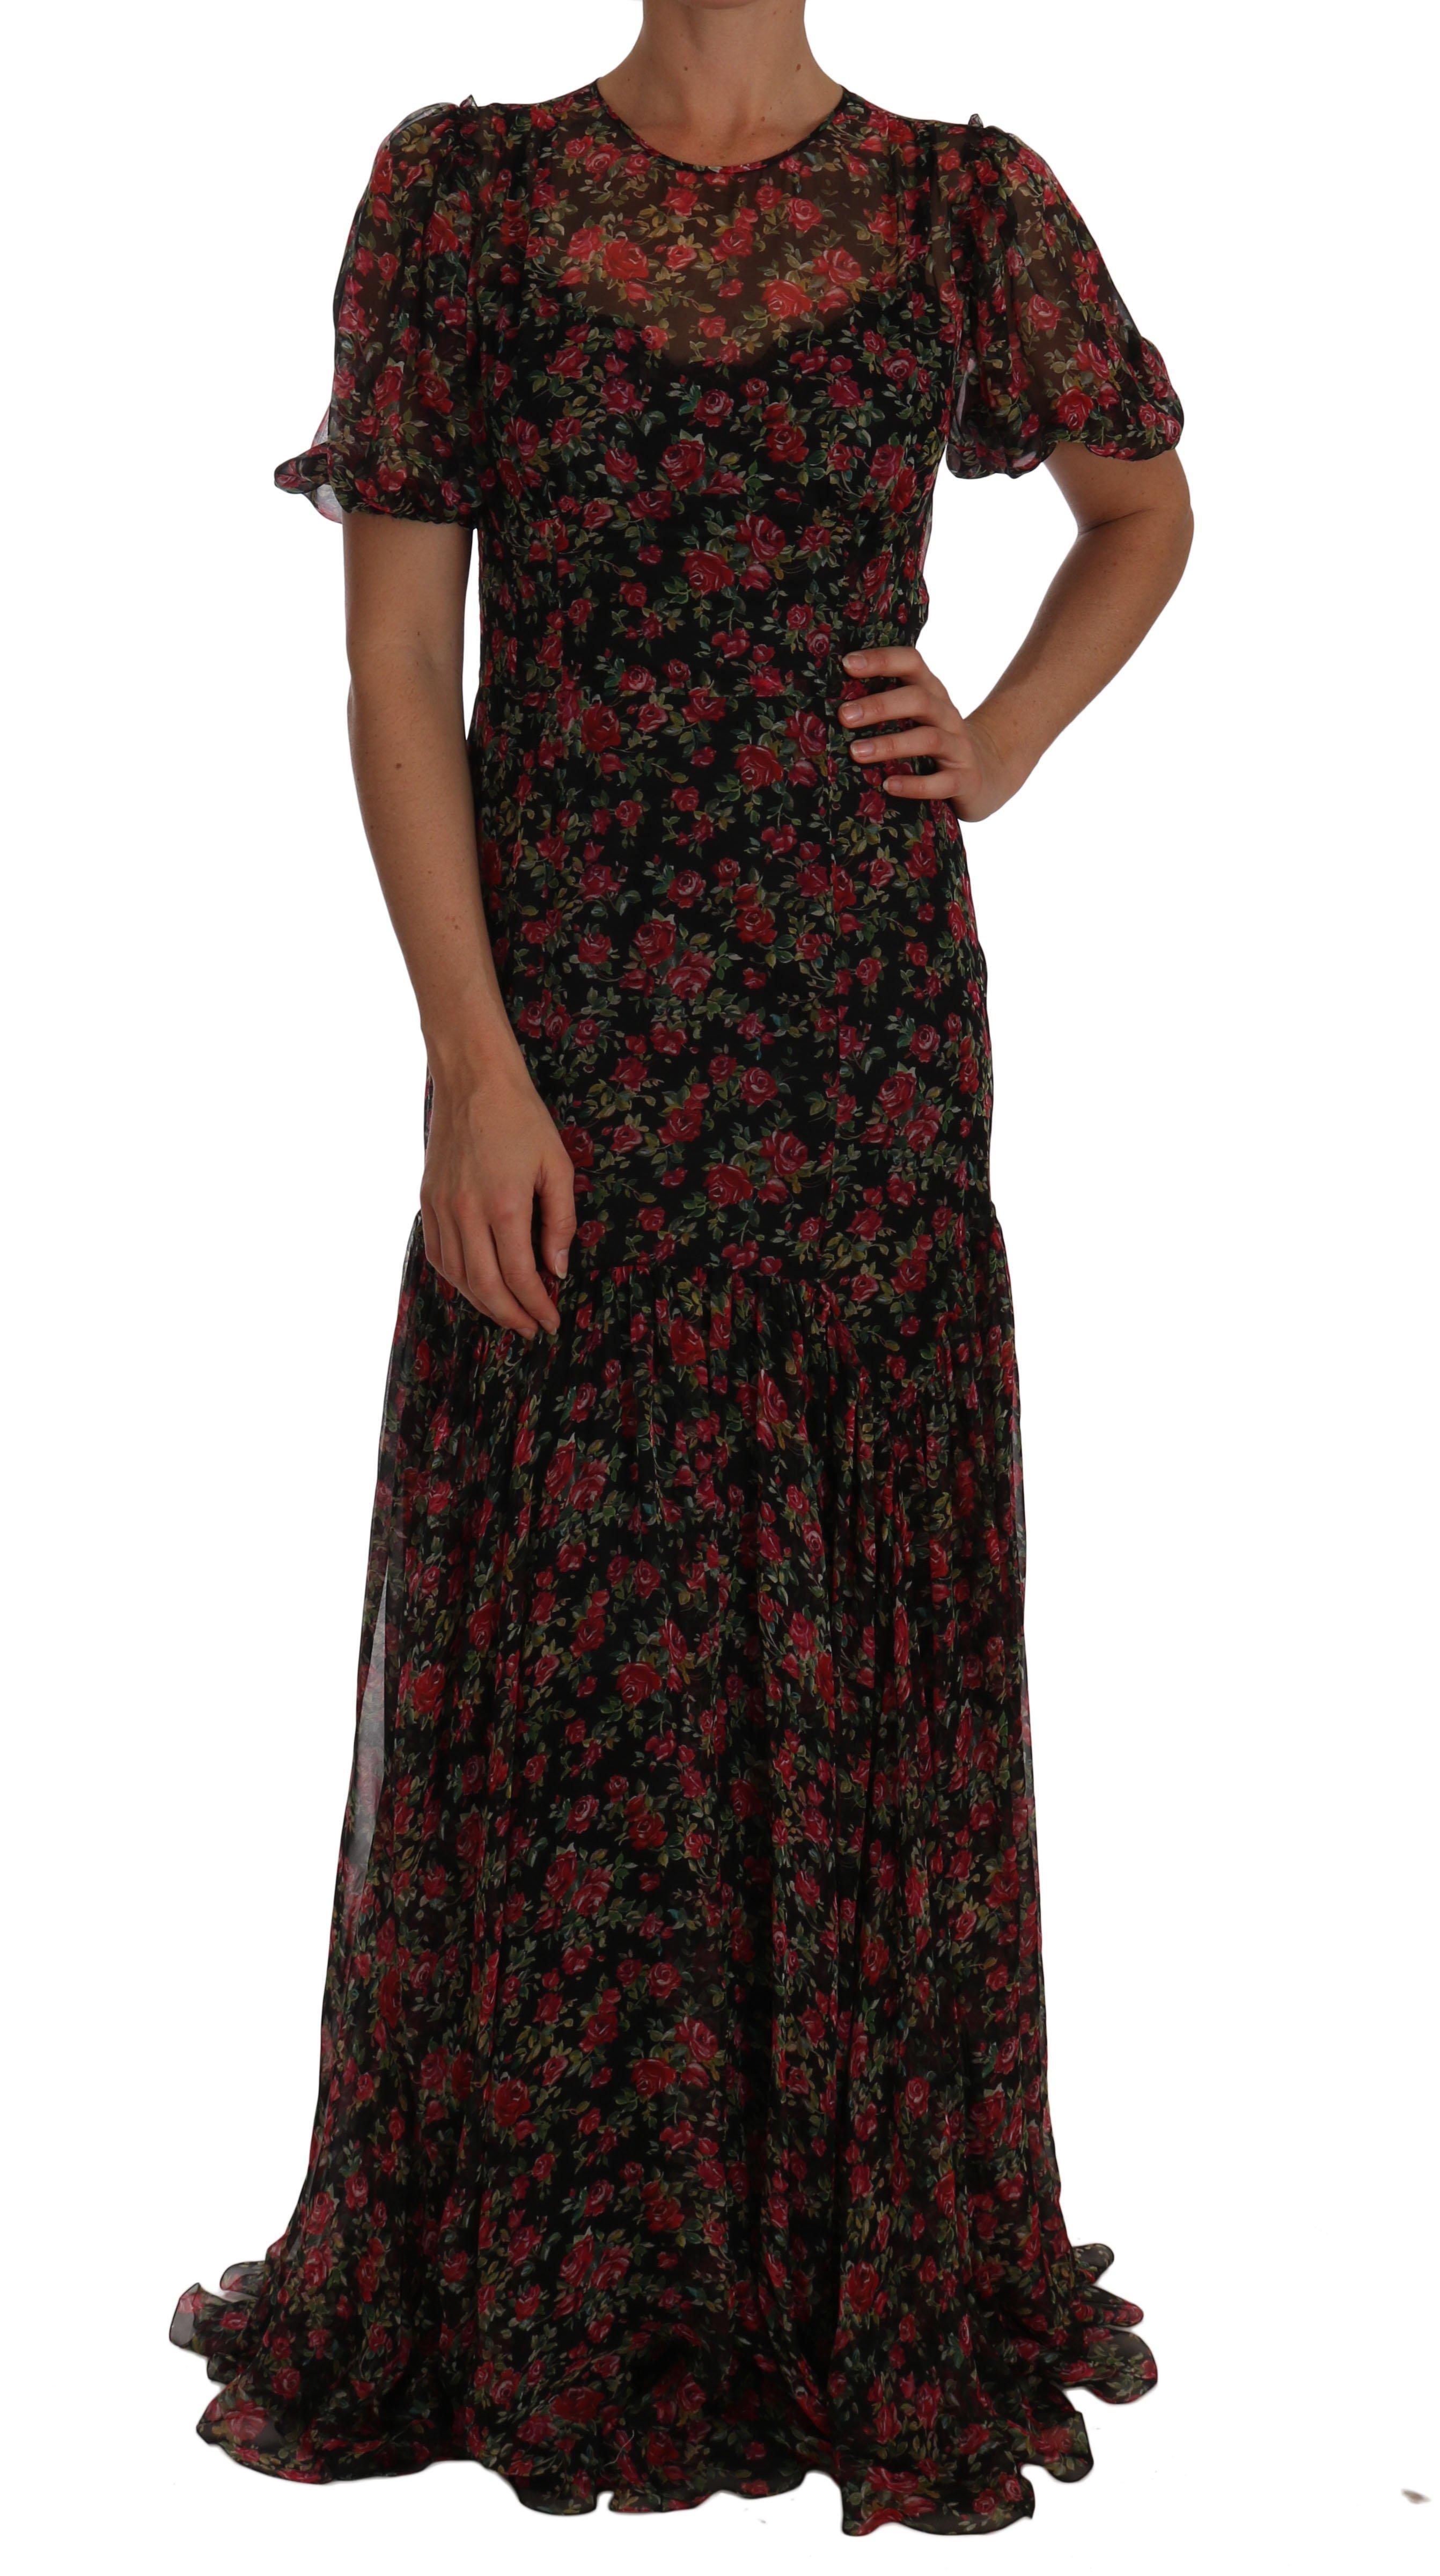 Dolce & Gabbana Women's Floral Roses A-Line Shift Gown Black DR1449 - IT40|S